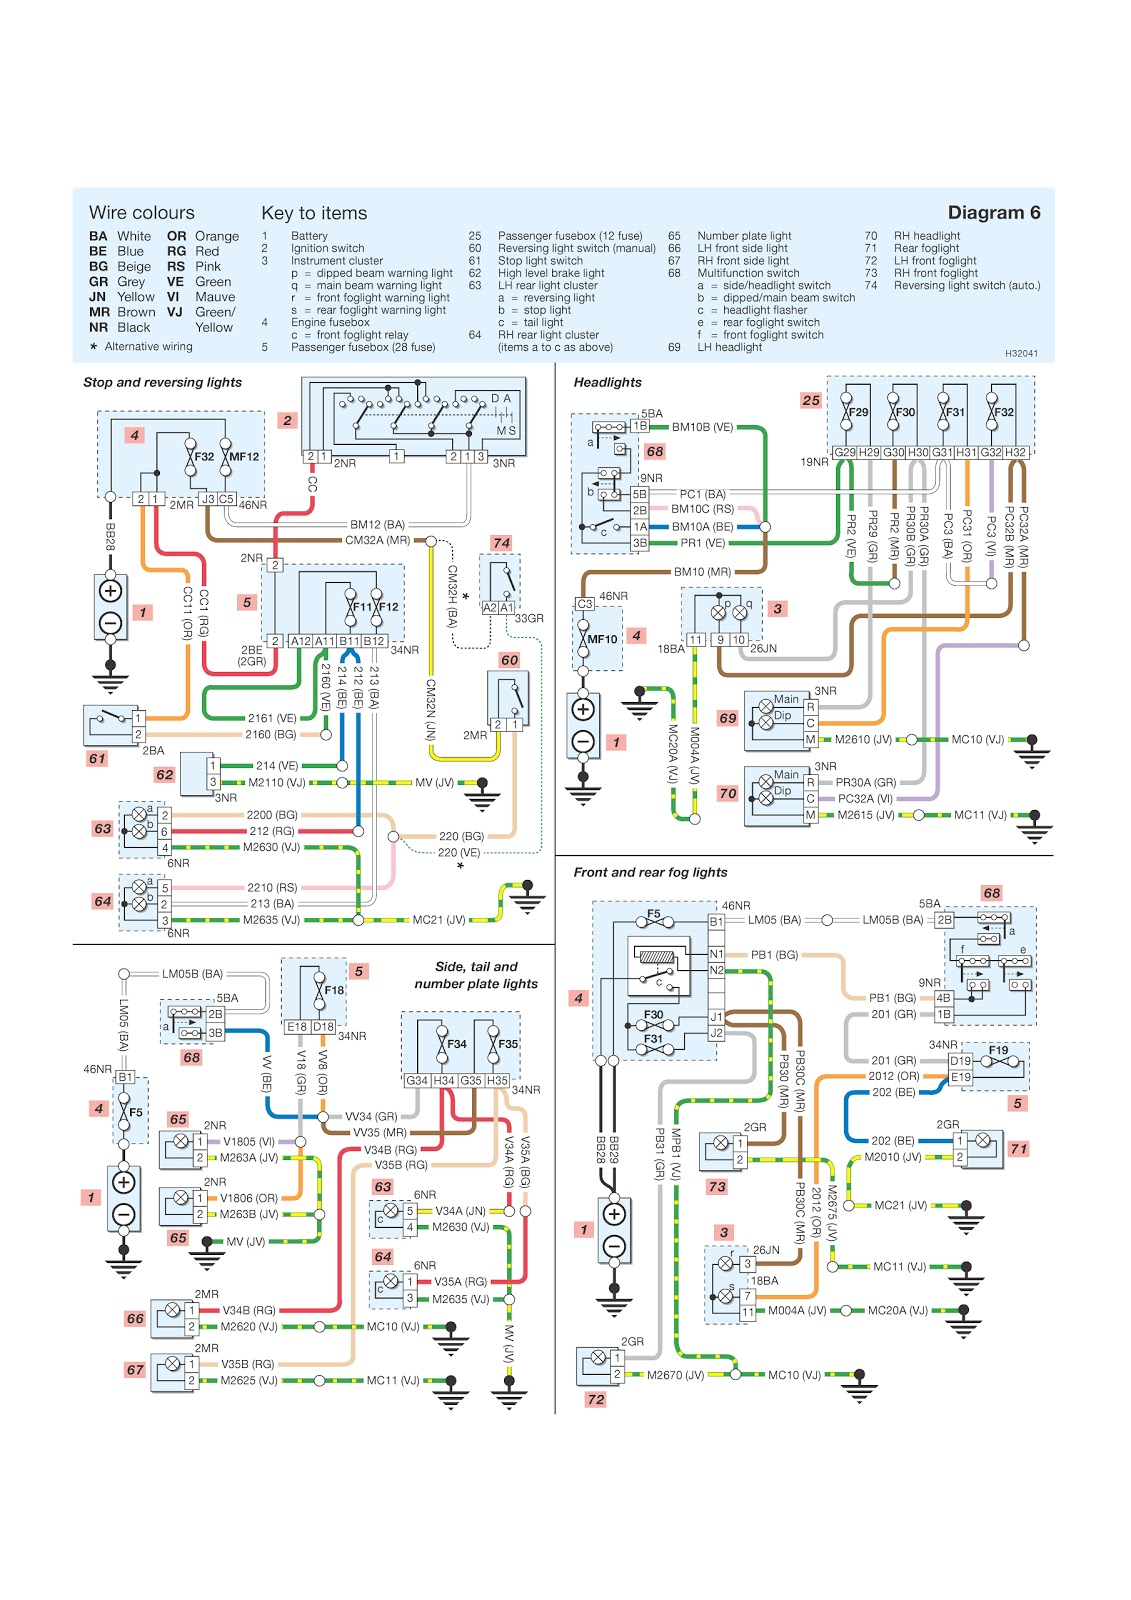 Peugeot 206 Wiring Diagram 4age Alternator Exterior Lighting Diagrams Schematic